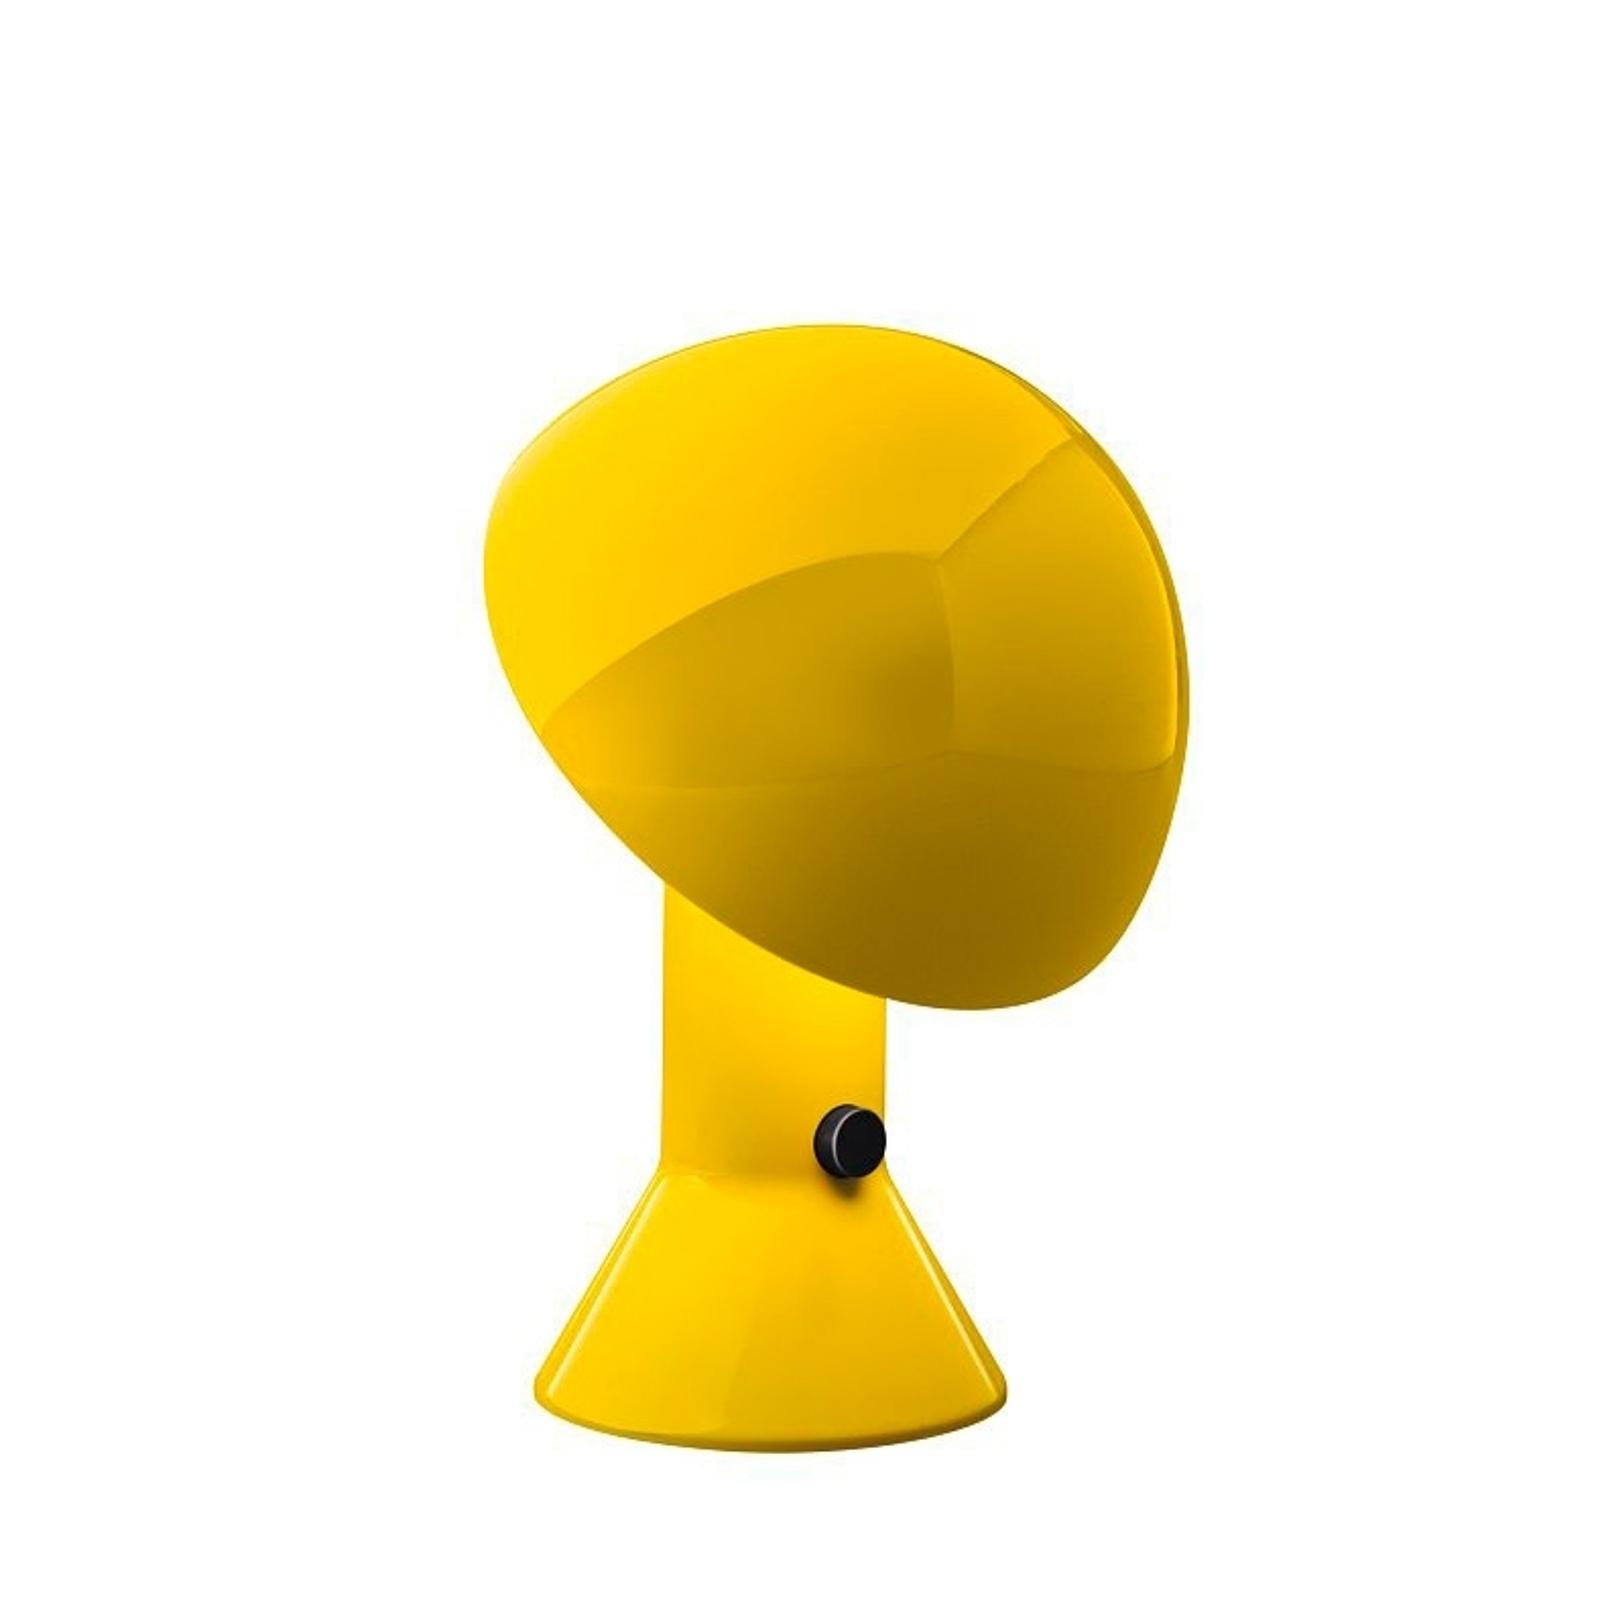 Martinelli Luce Elmetto lámpara de mesa, amarillo